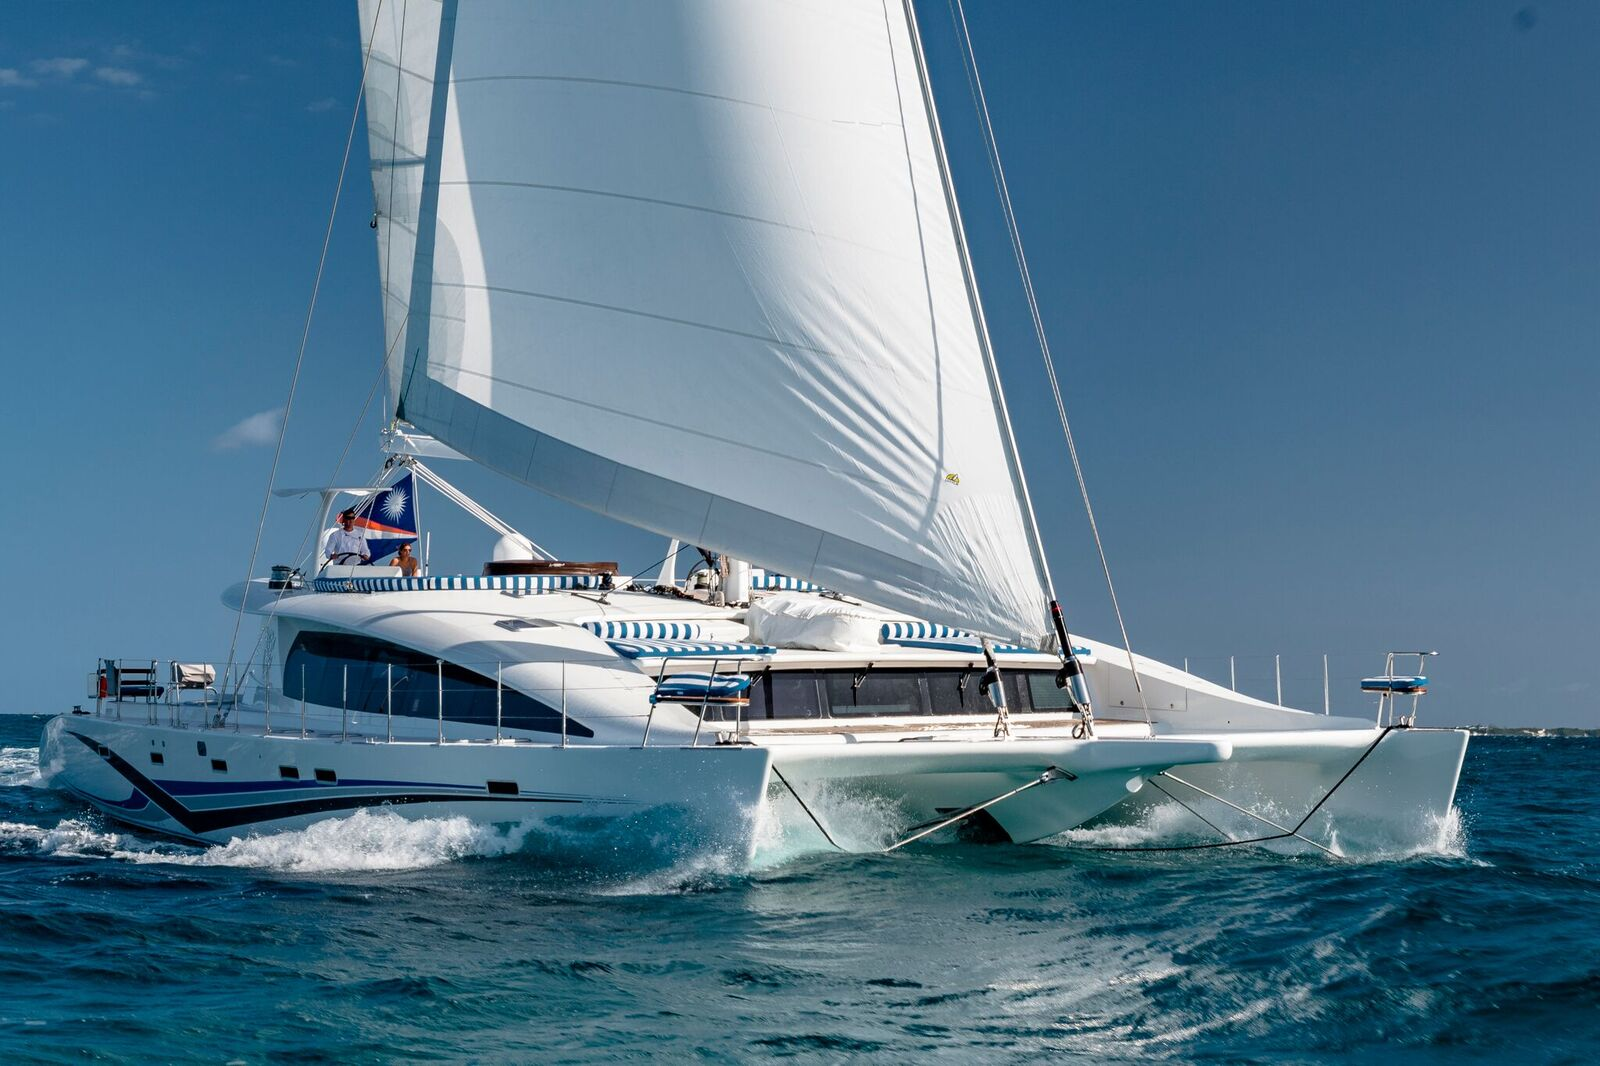 Blue Gryphon Catamaran Sailing